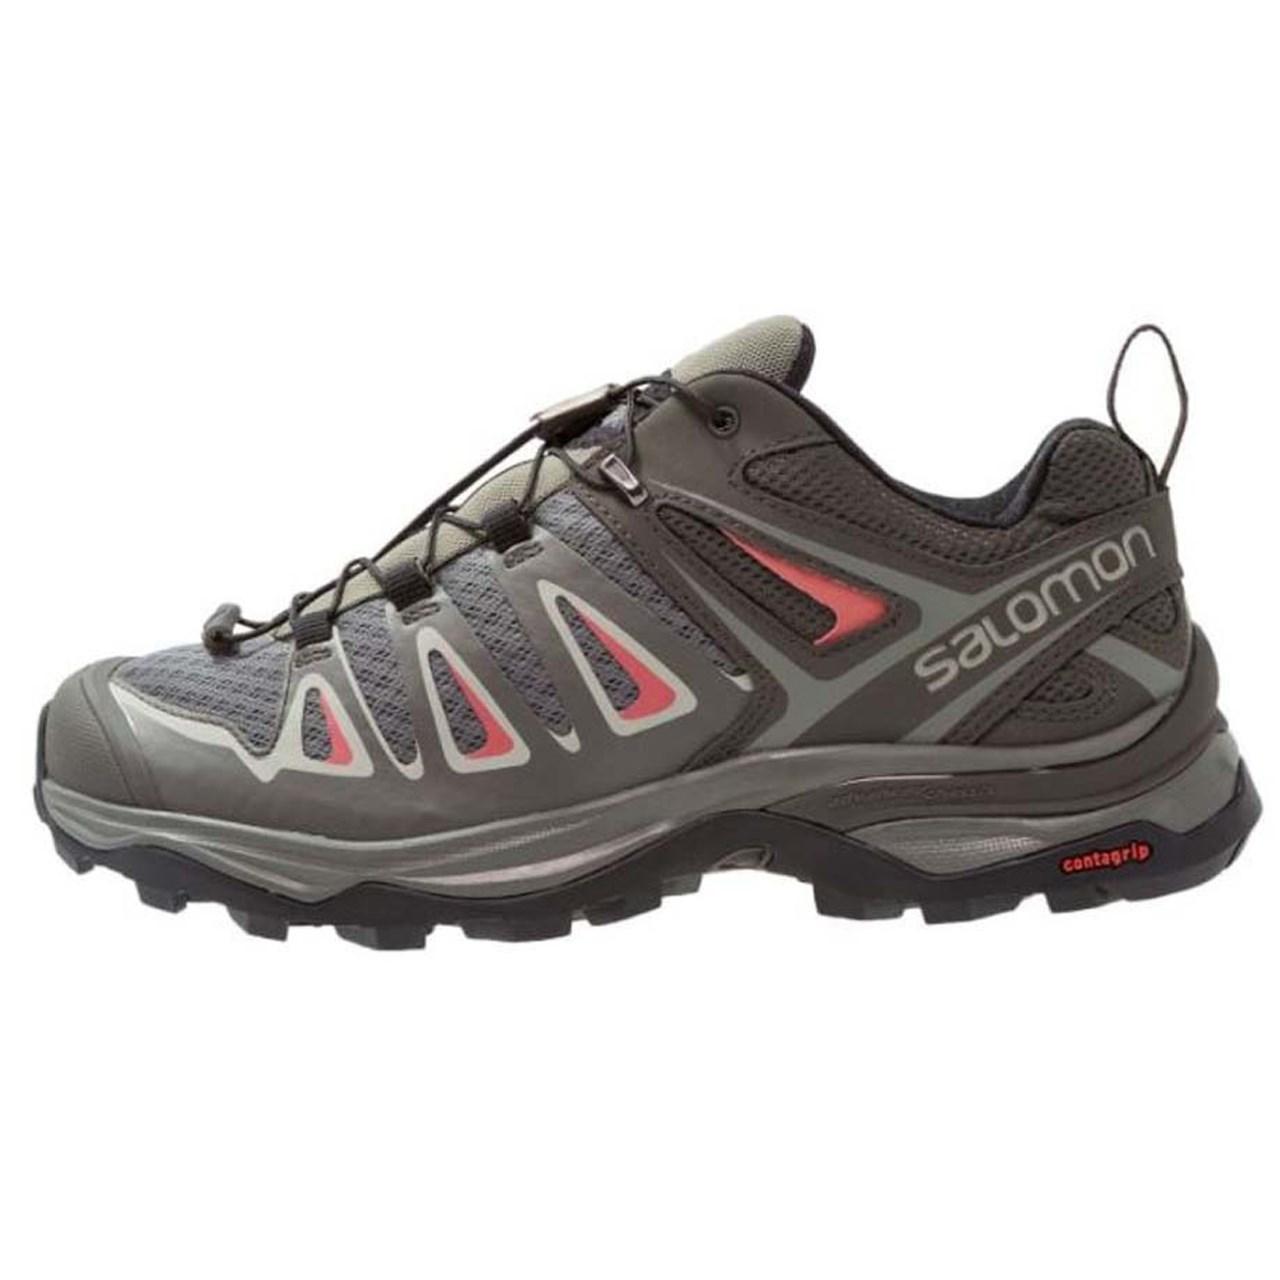 کفش کوهنوردی زنانه سالومون مدل 400026